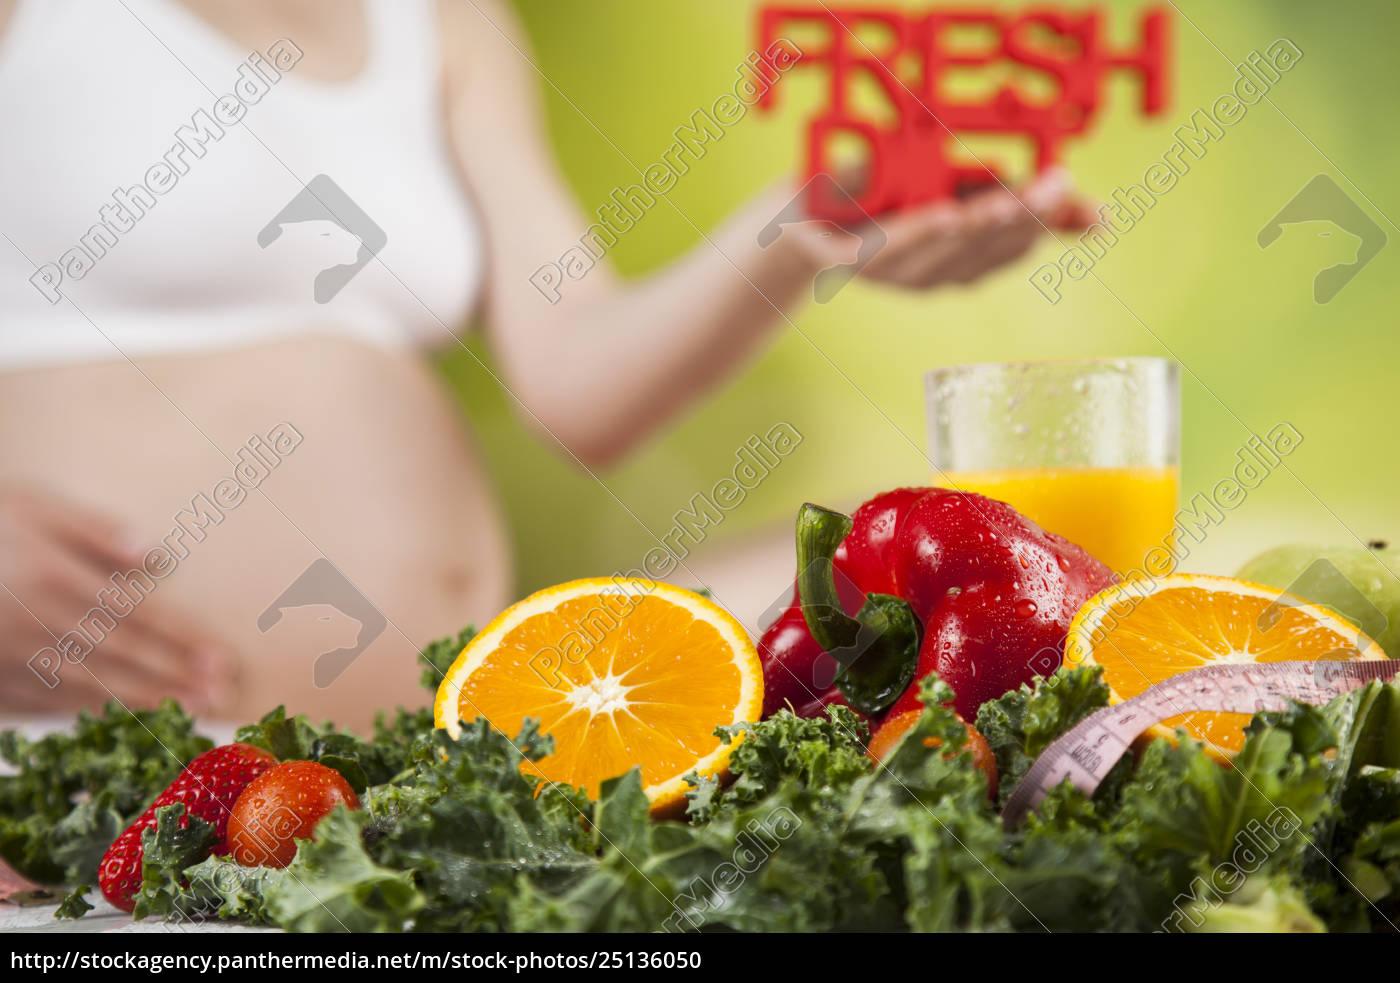 pregnant, woman, fruits - 25136050